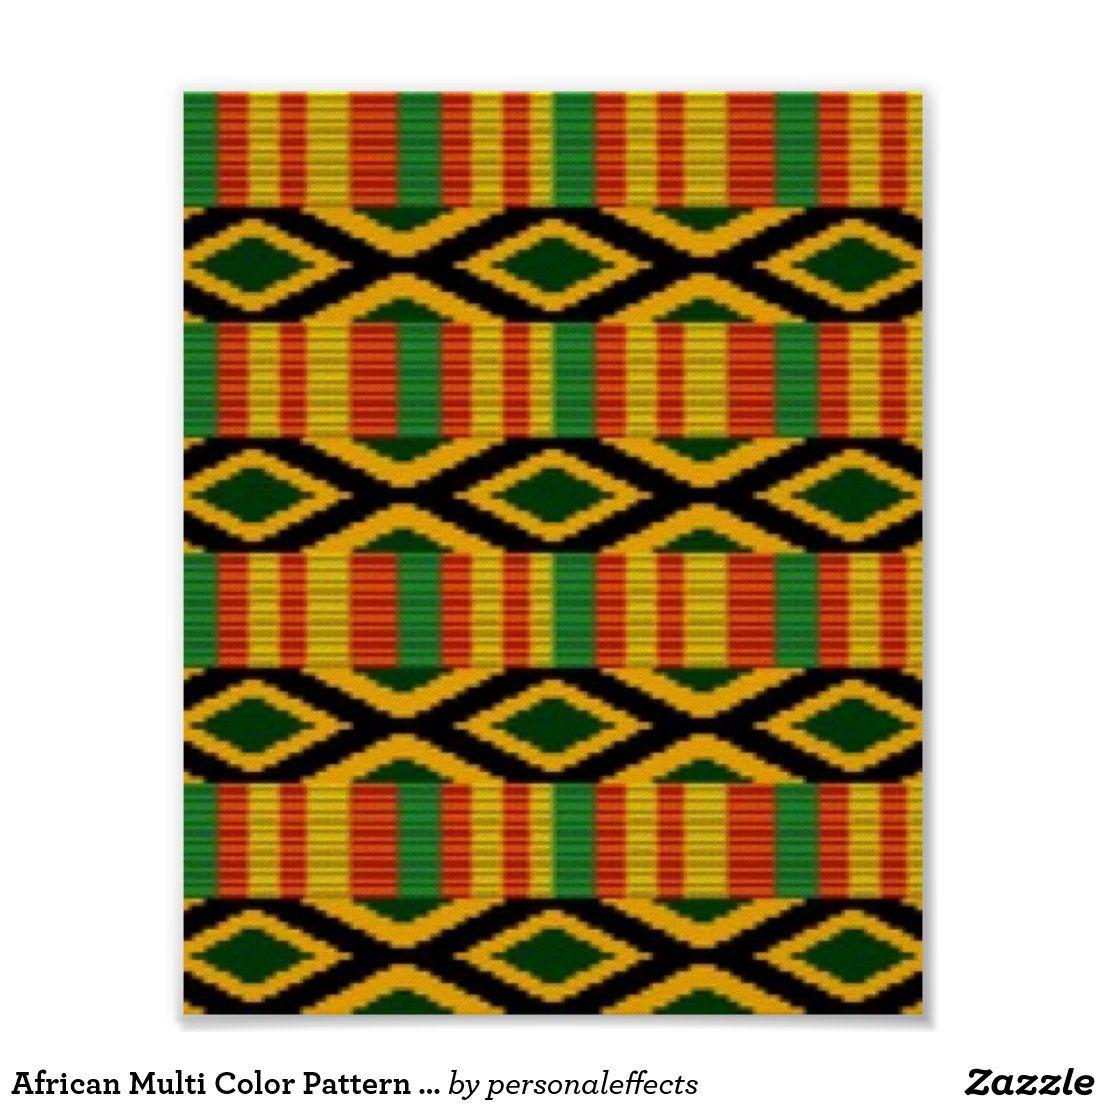 African Multi Color Pattern Print Design Zazzle Com In 2021 Print Patterns Background Patterns African Colors